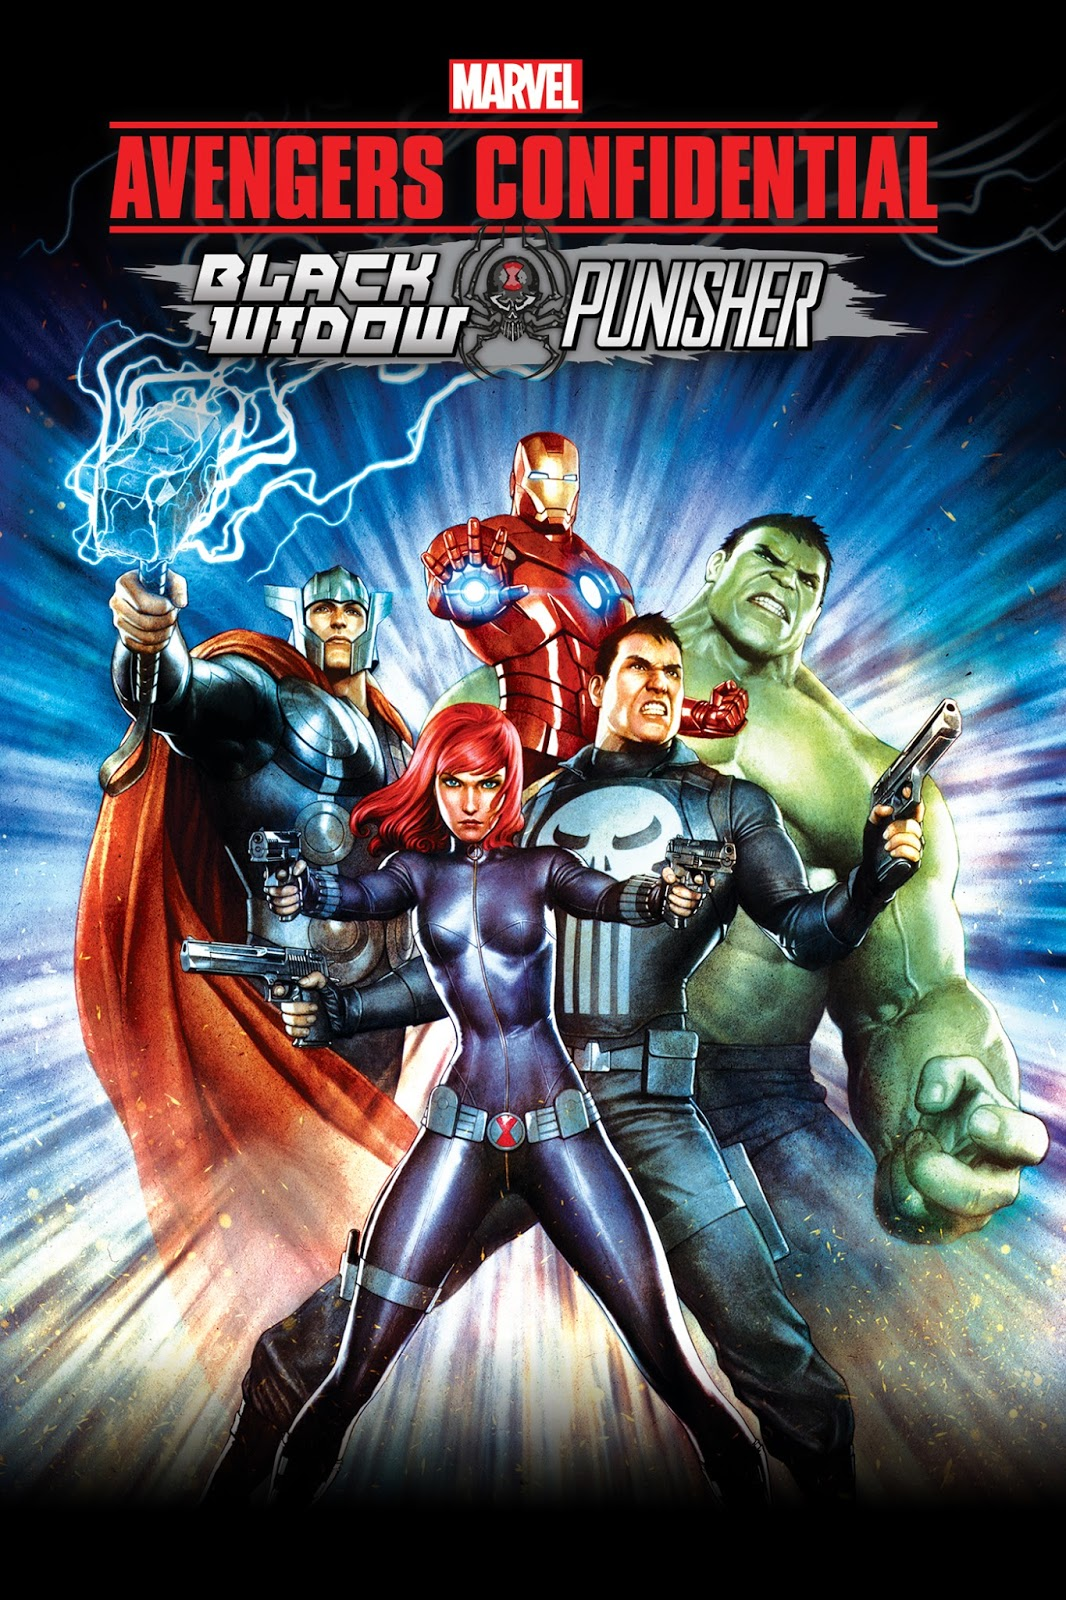 Avengers Confidential: Black Widow ขบวนการ อเวนเจอร์ส แบล็ควิโดว์ กับ พันนิชเชอร์ [HD][พากย์ไทย]